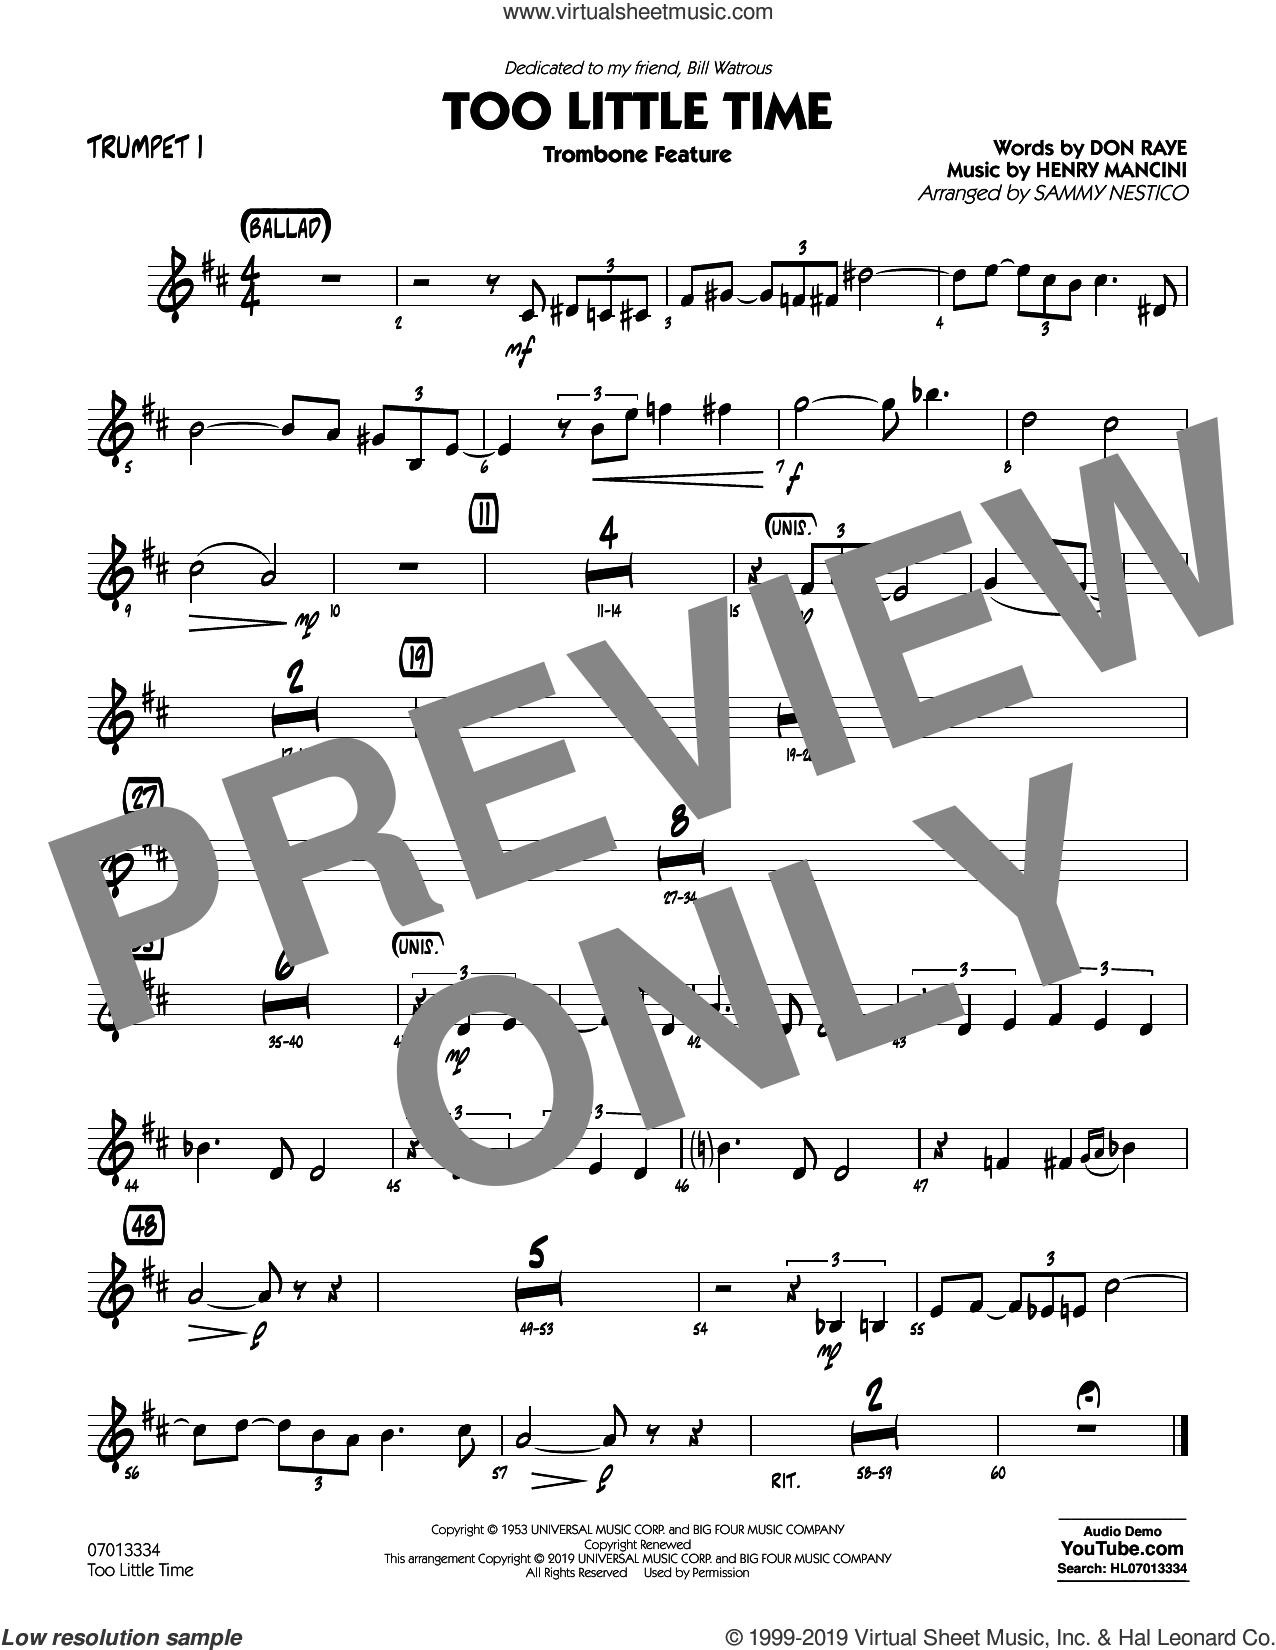 Too Little Time (arr. Sammy Nestico), conductor score (full score) sheet music for jazz band (trumpet 1) by Henry Mancini, Sammy Nestico, Bill Watrous and Don Raye, intermediate skill level